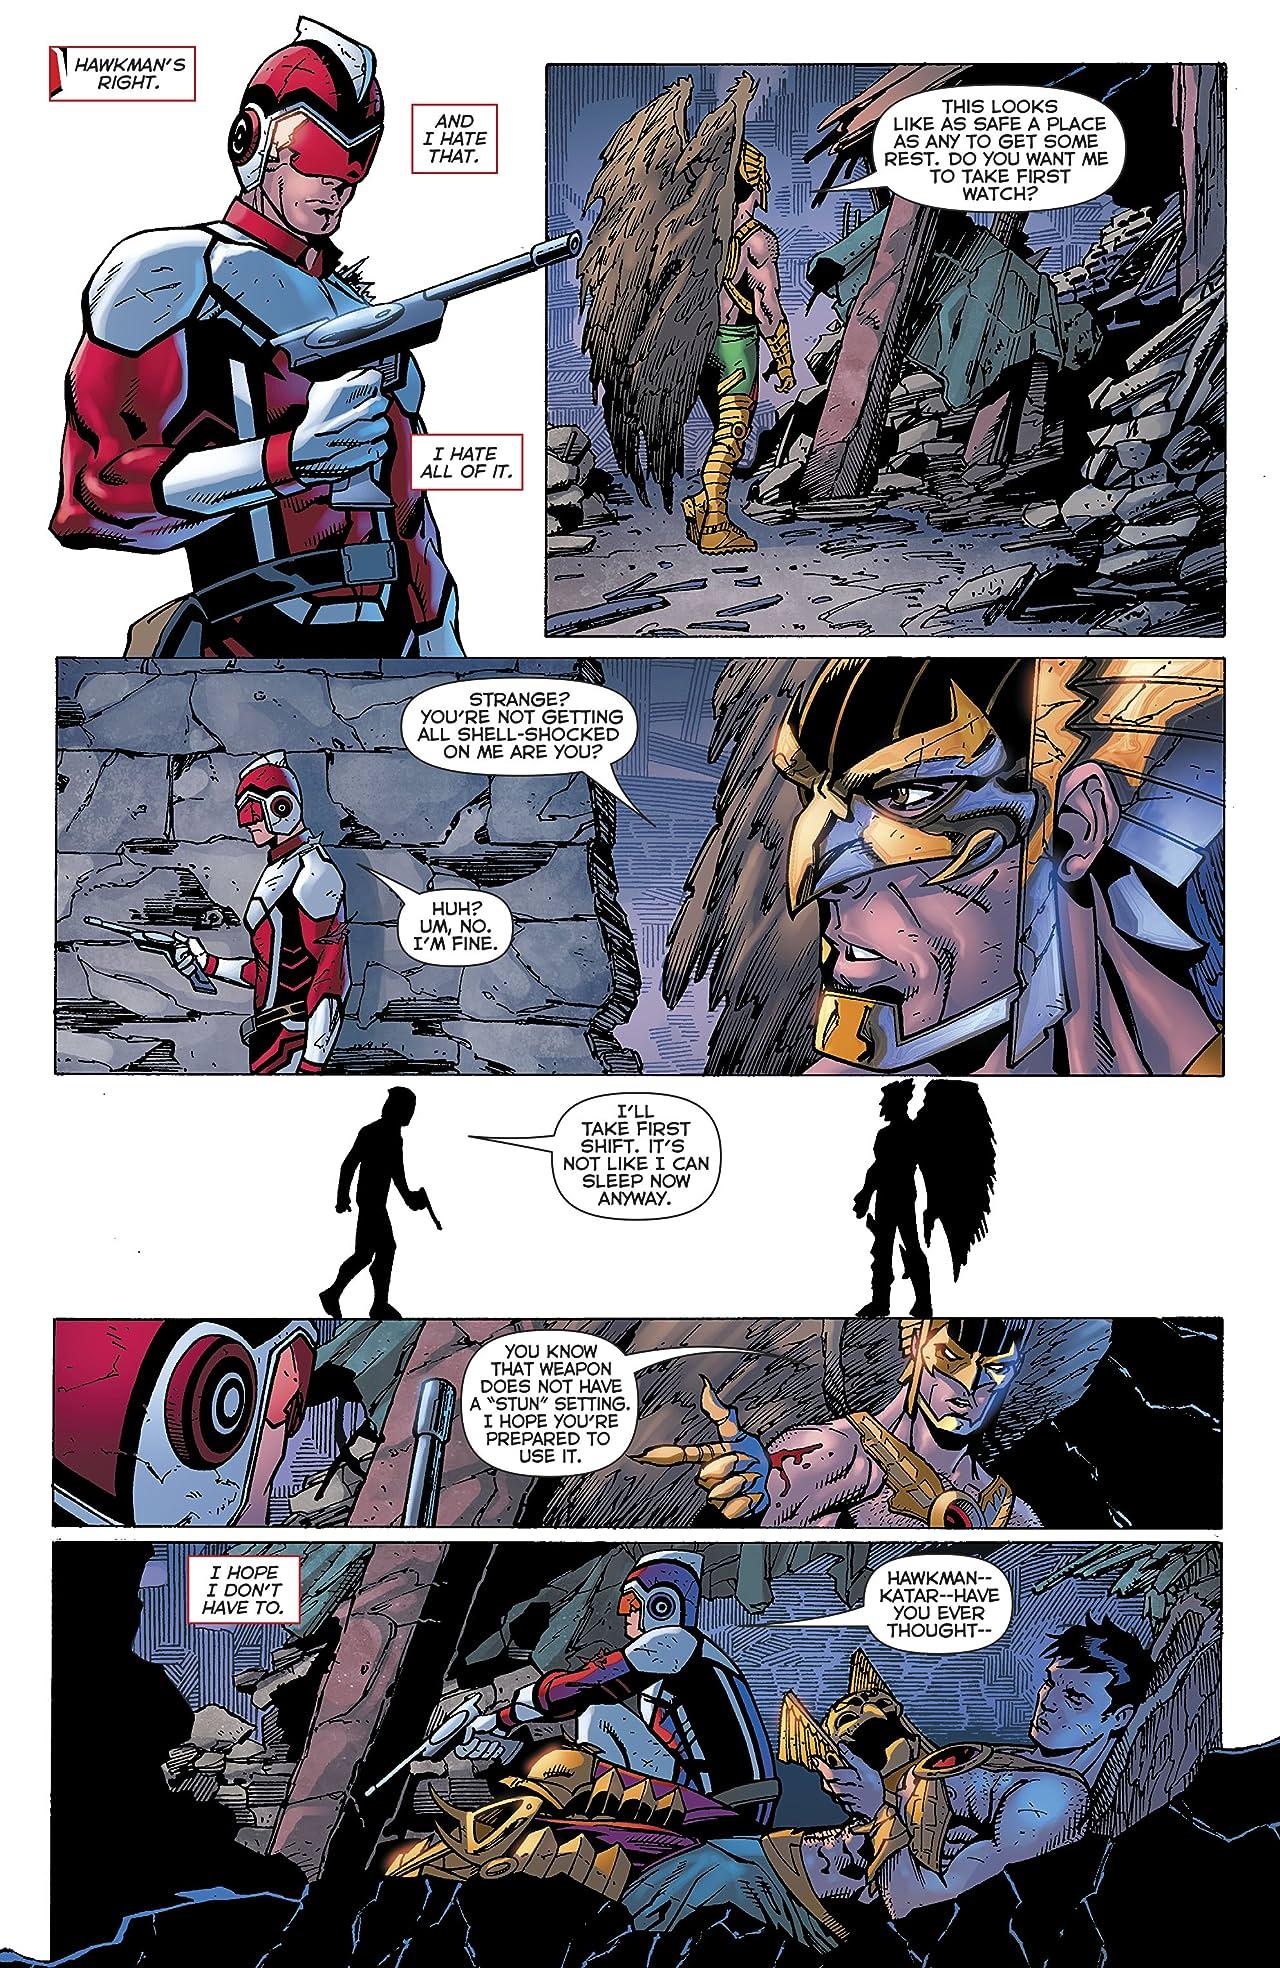 Death of Hawkman (2016-2017) #3